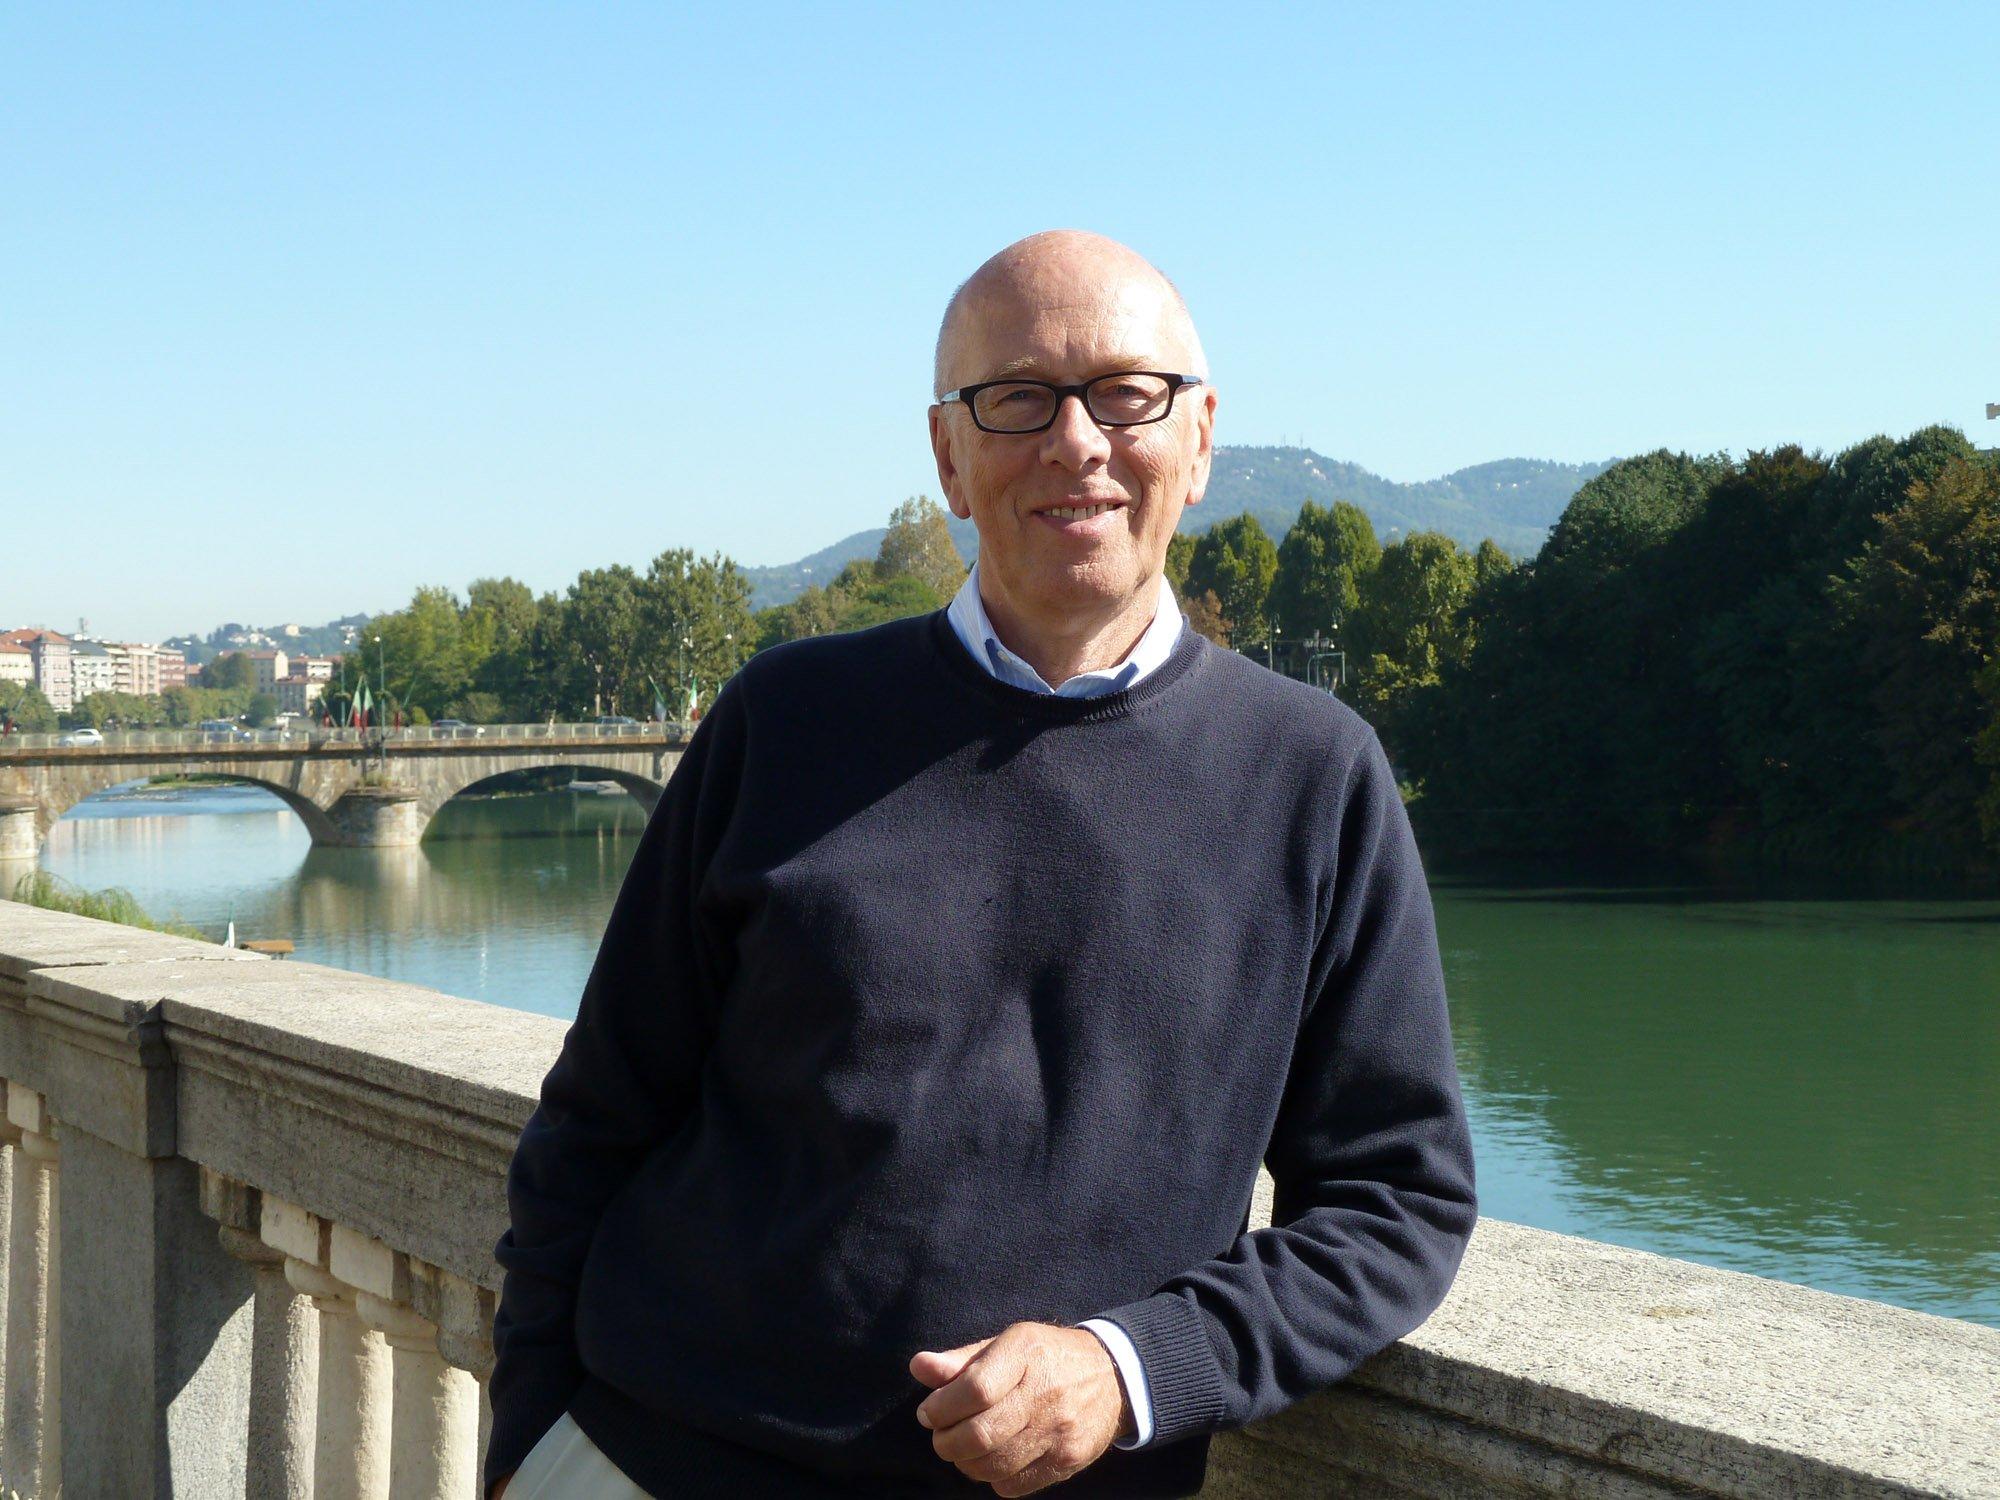 Alberto Peola, Torino